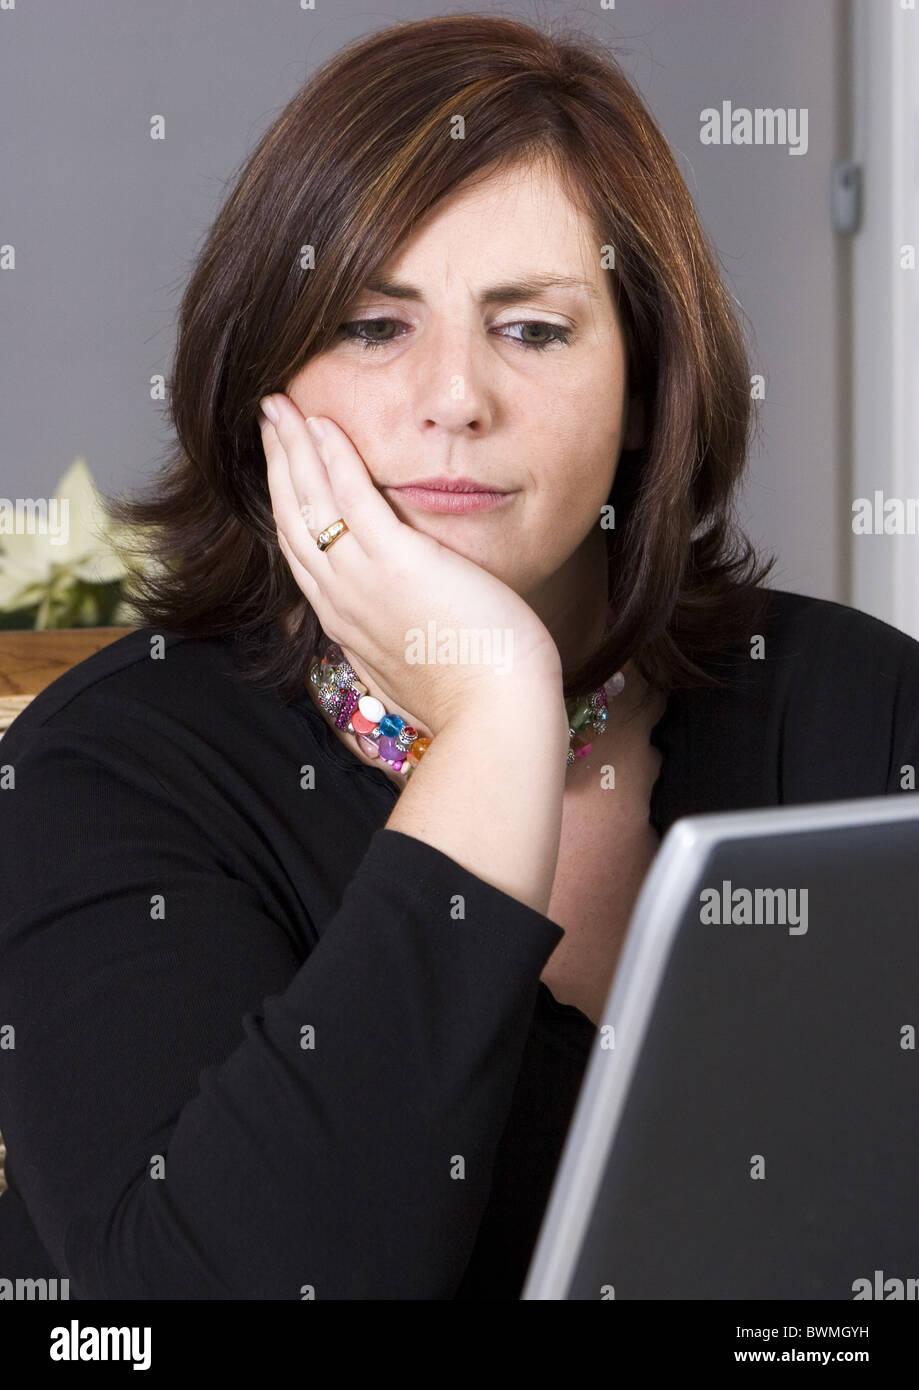 Moody woman behind computer screen - Stock Image